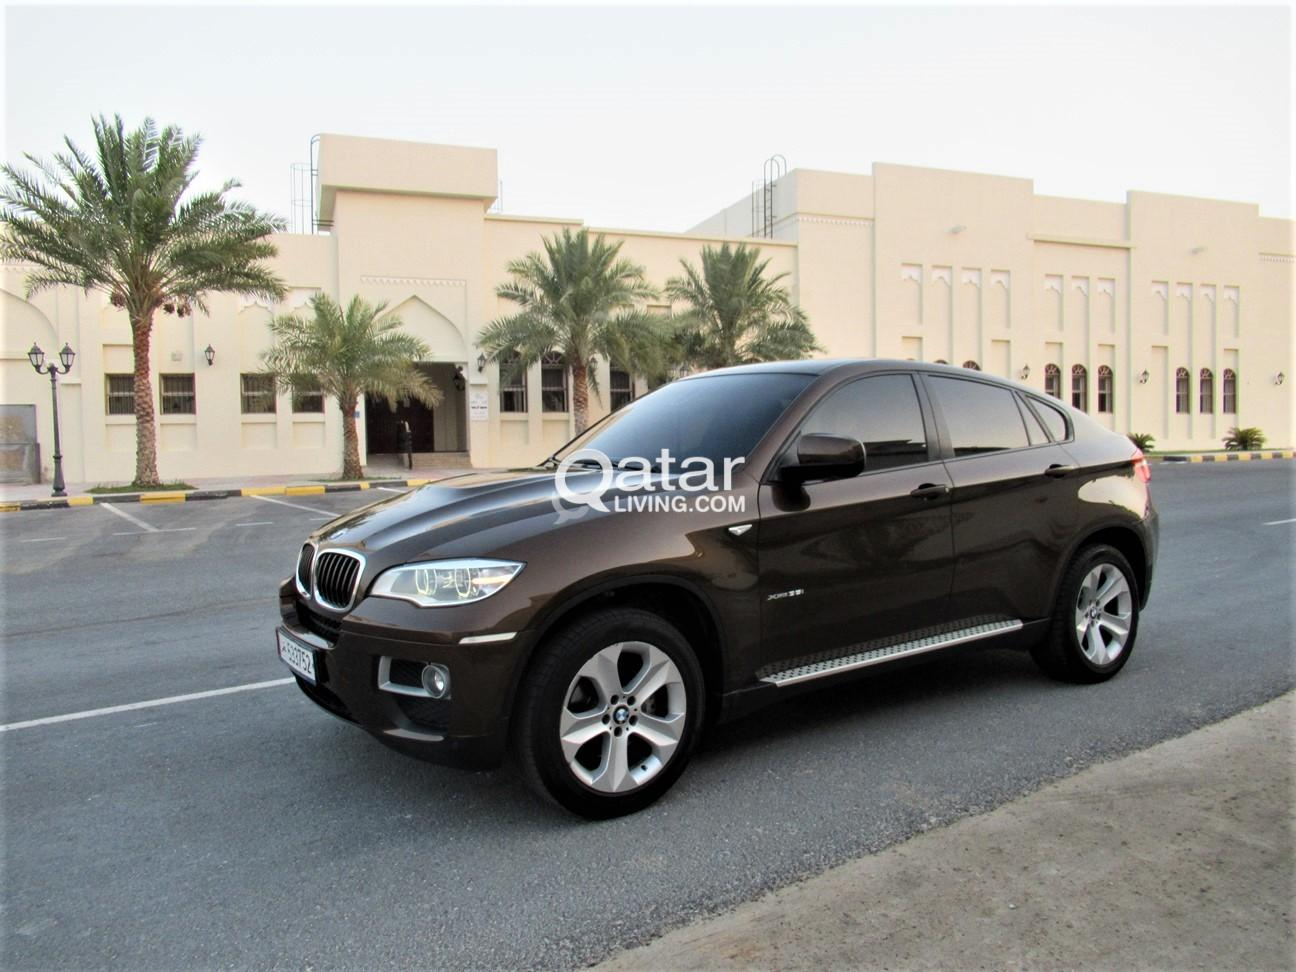 URGENT SALE BMW X6 MODEL 2013 FULL OPTION